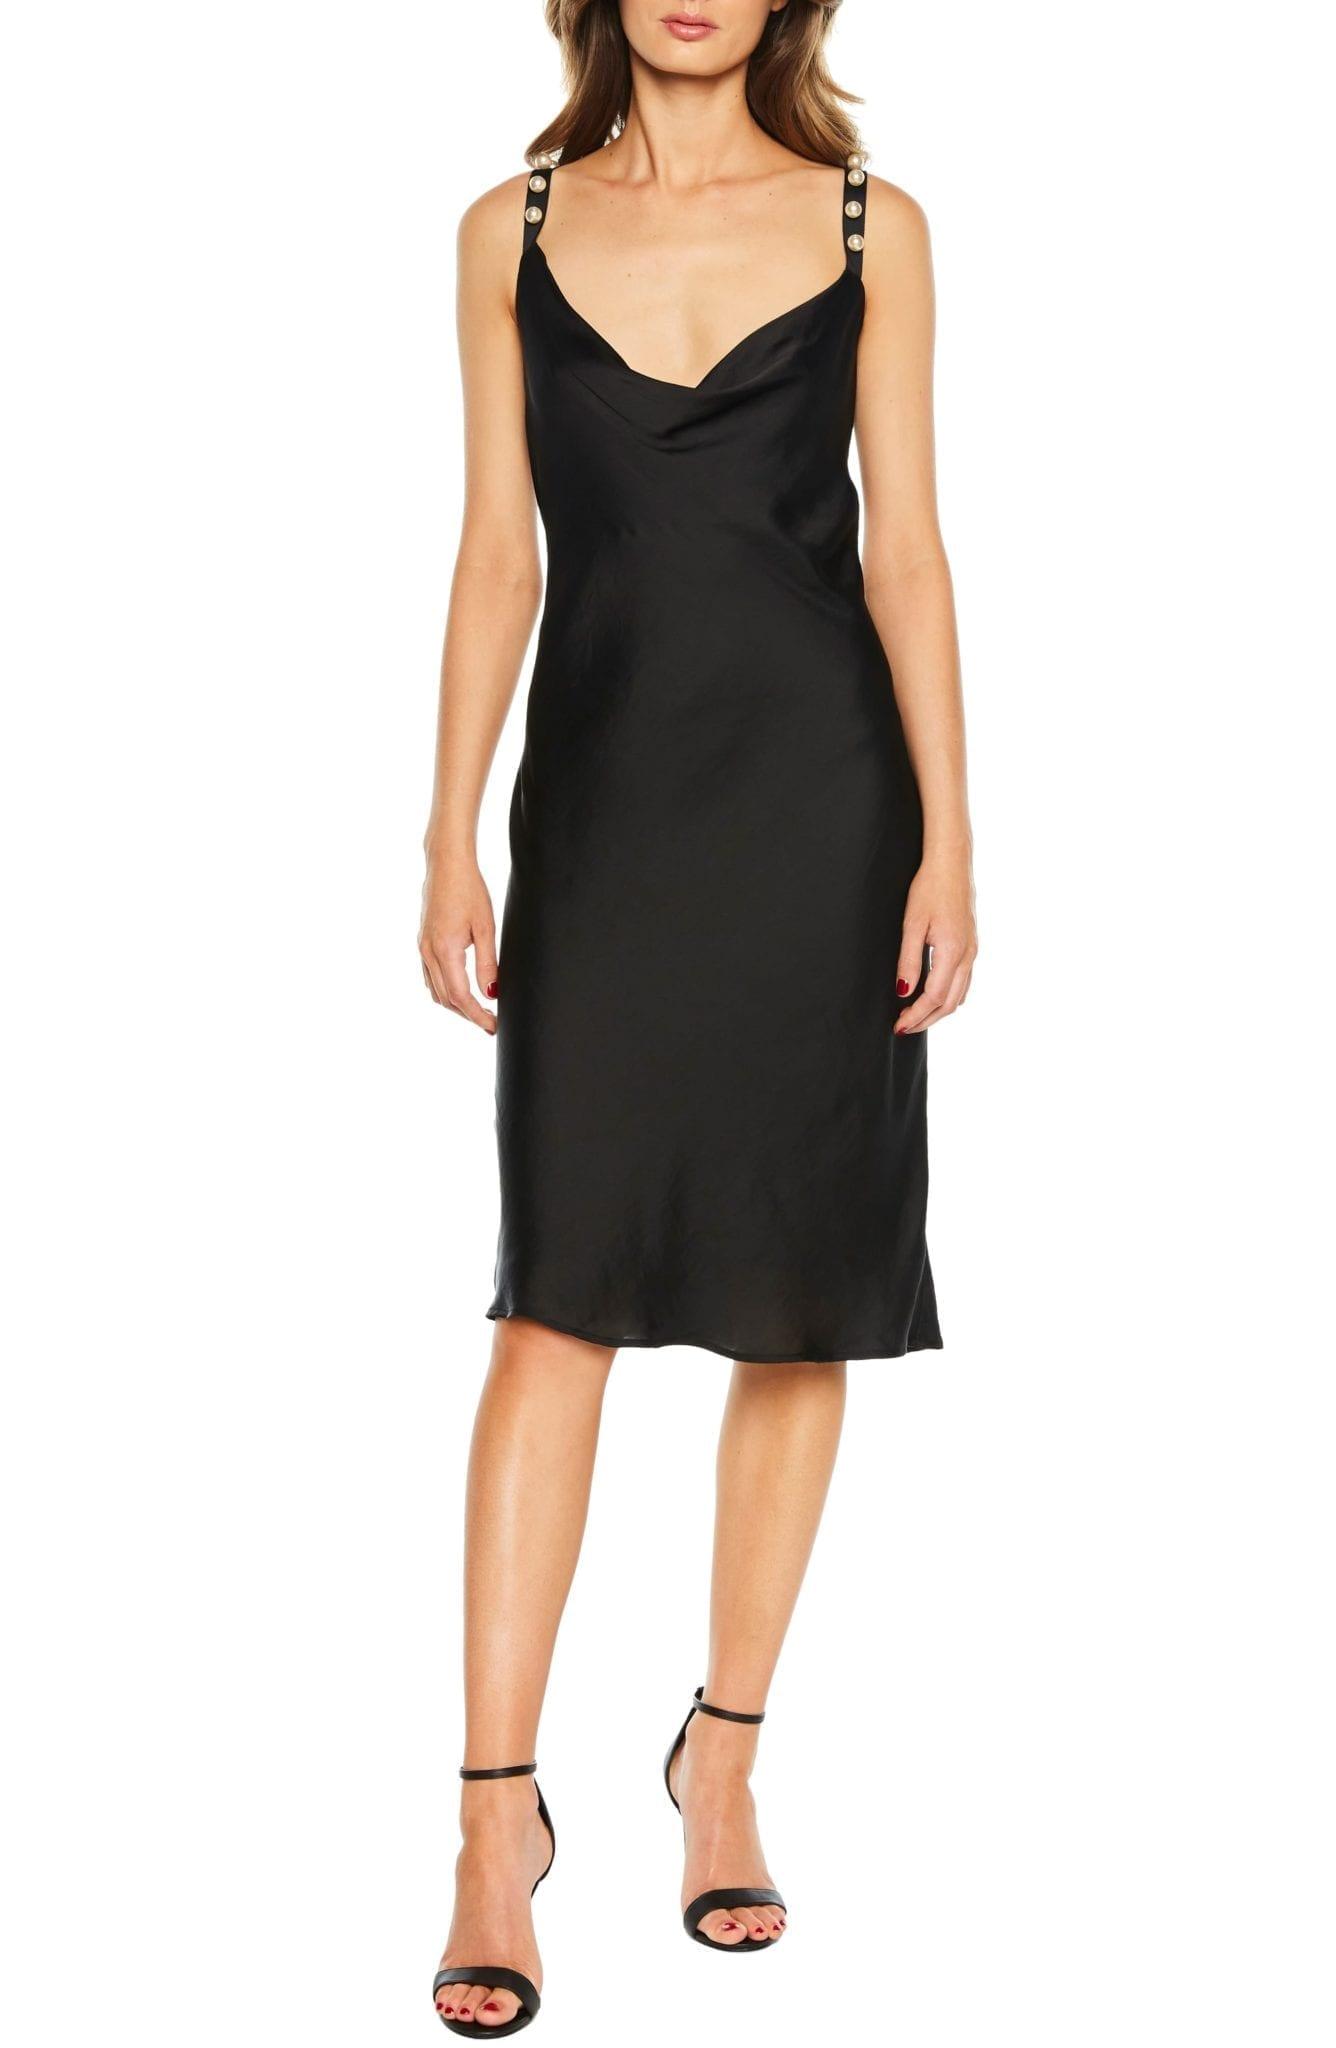 BARDOT Pearl Strap Slip Black Dress